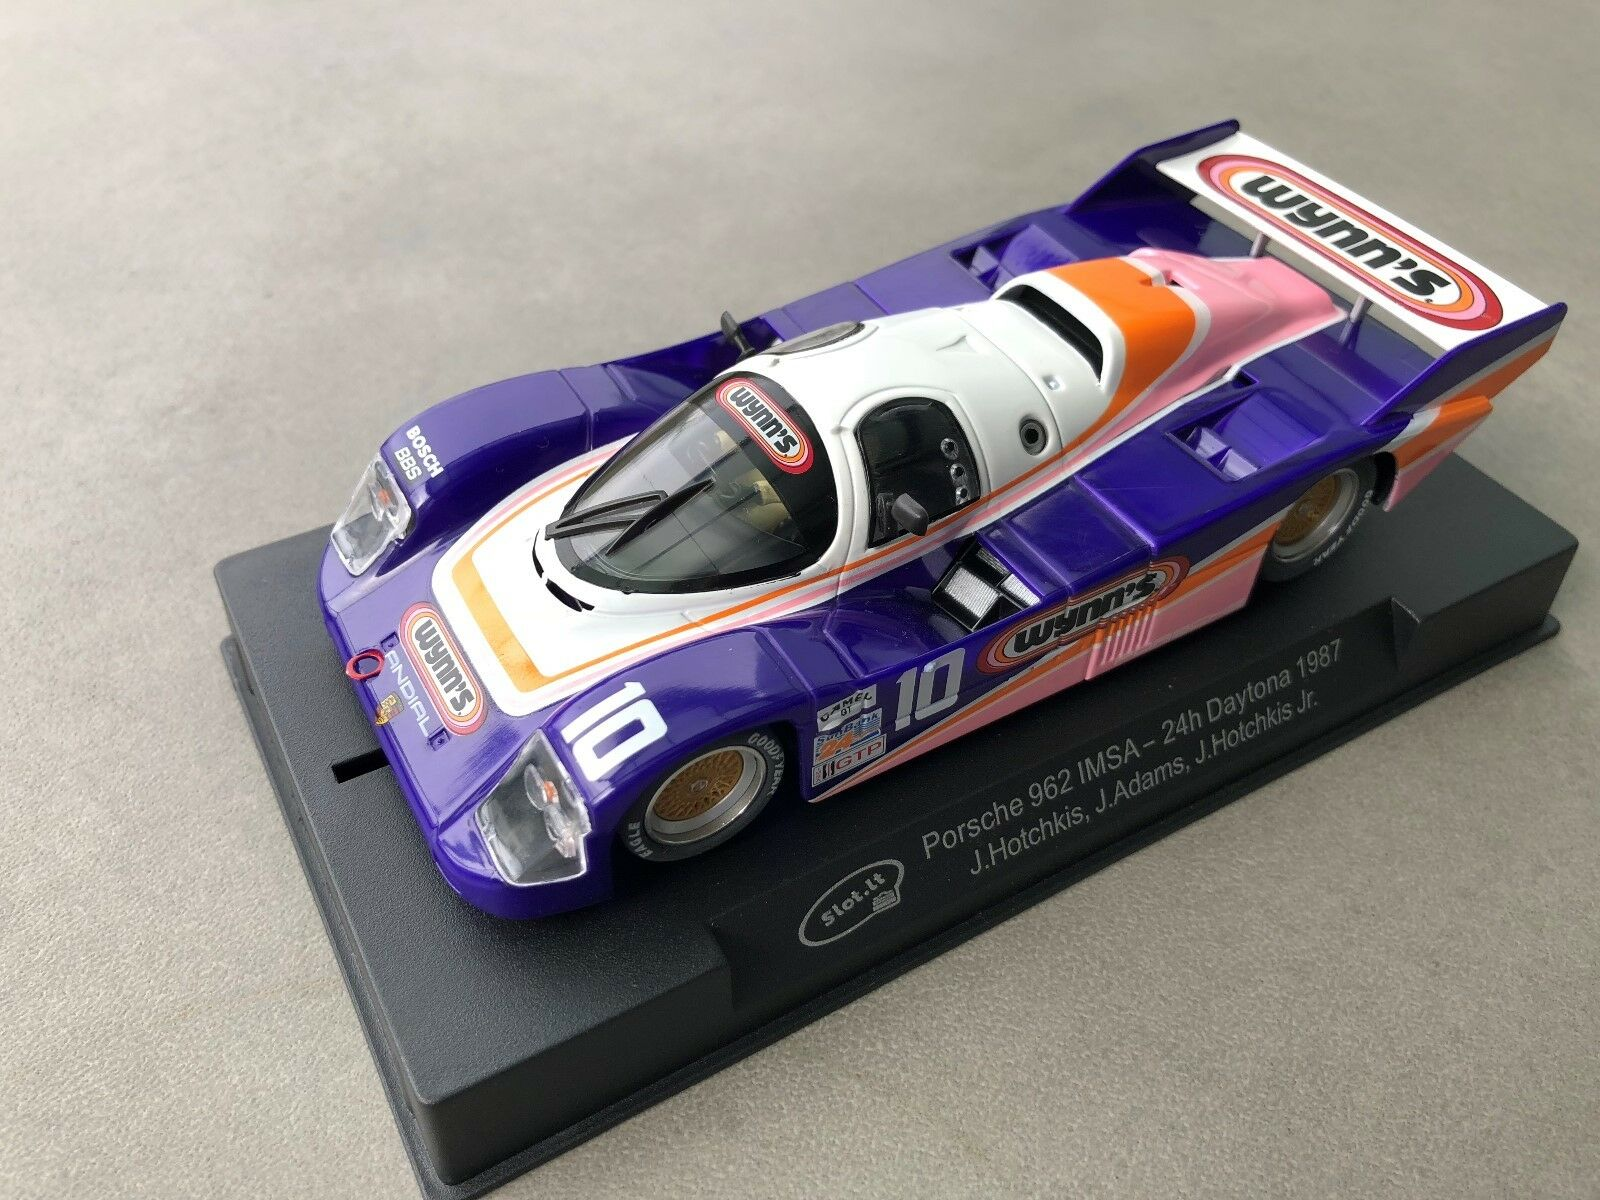 Slot  CA25d Porsche 962 Imsa -24H Daytona 1987 J. Hotchkis,J. Adams